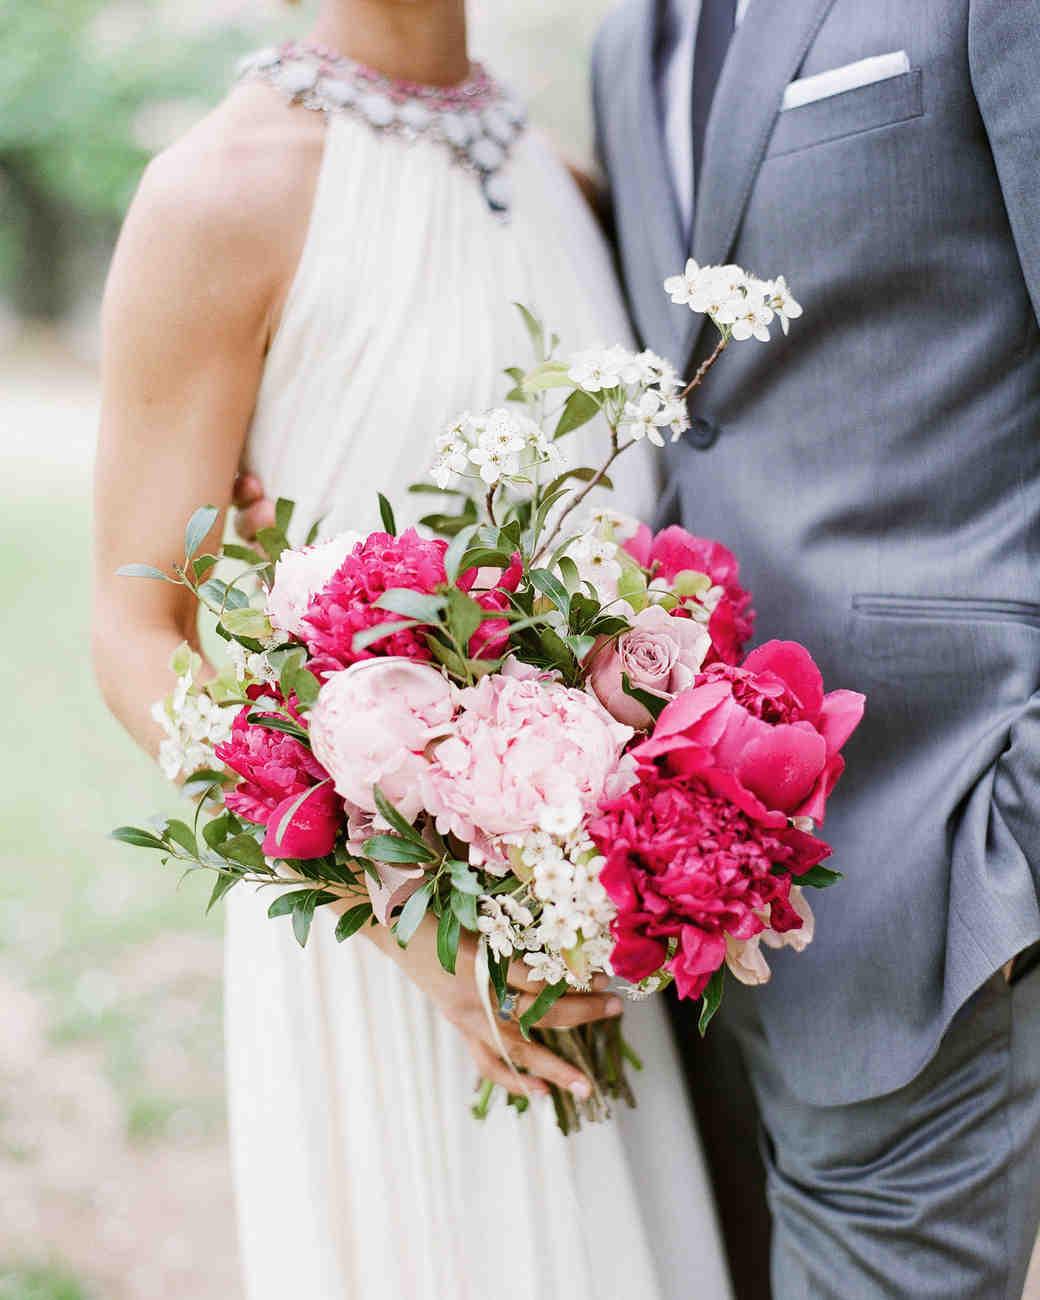 randy-mayo-celebrations-heather-waraksa-pink-bouquet-0569-s112716.jpg